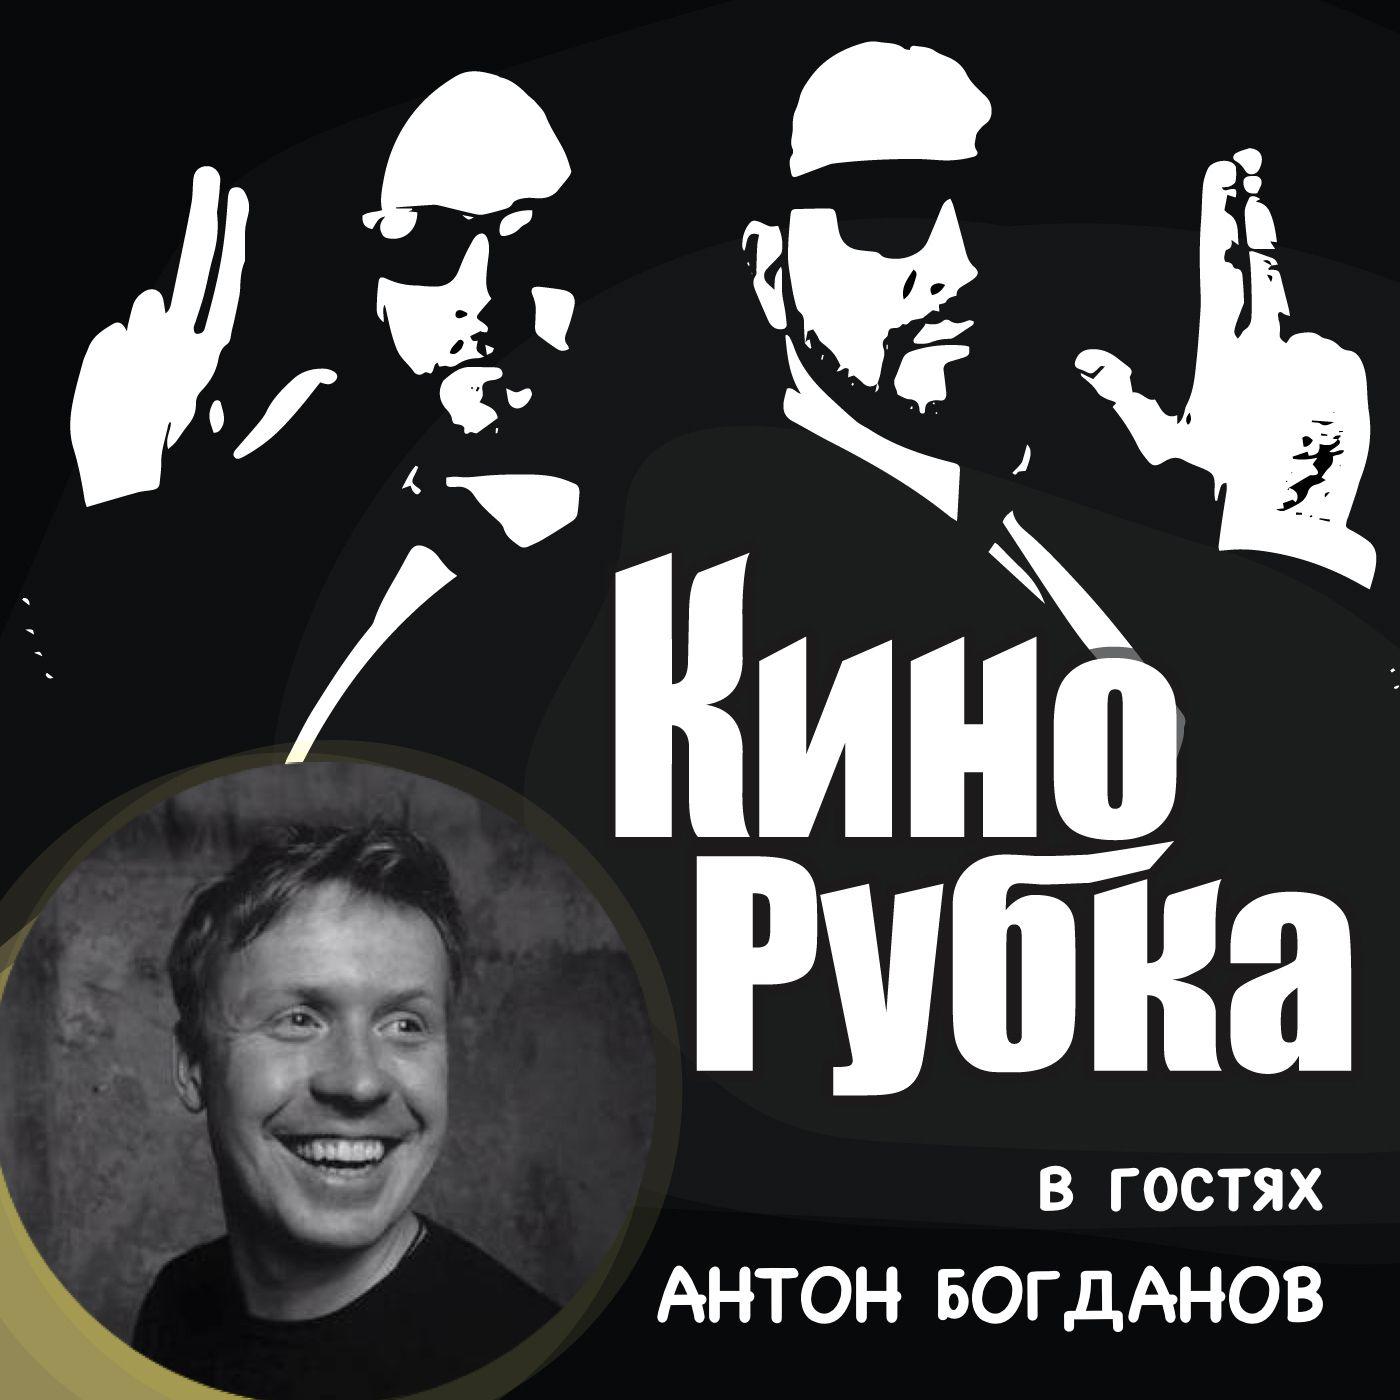 Павел Дикан Актер театра и кино Антон Богданов павел дикан актер театра и кино николай цонку